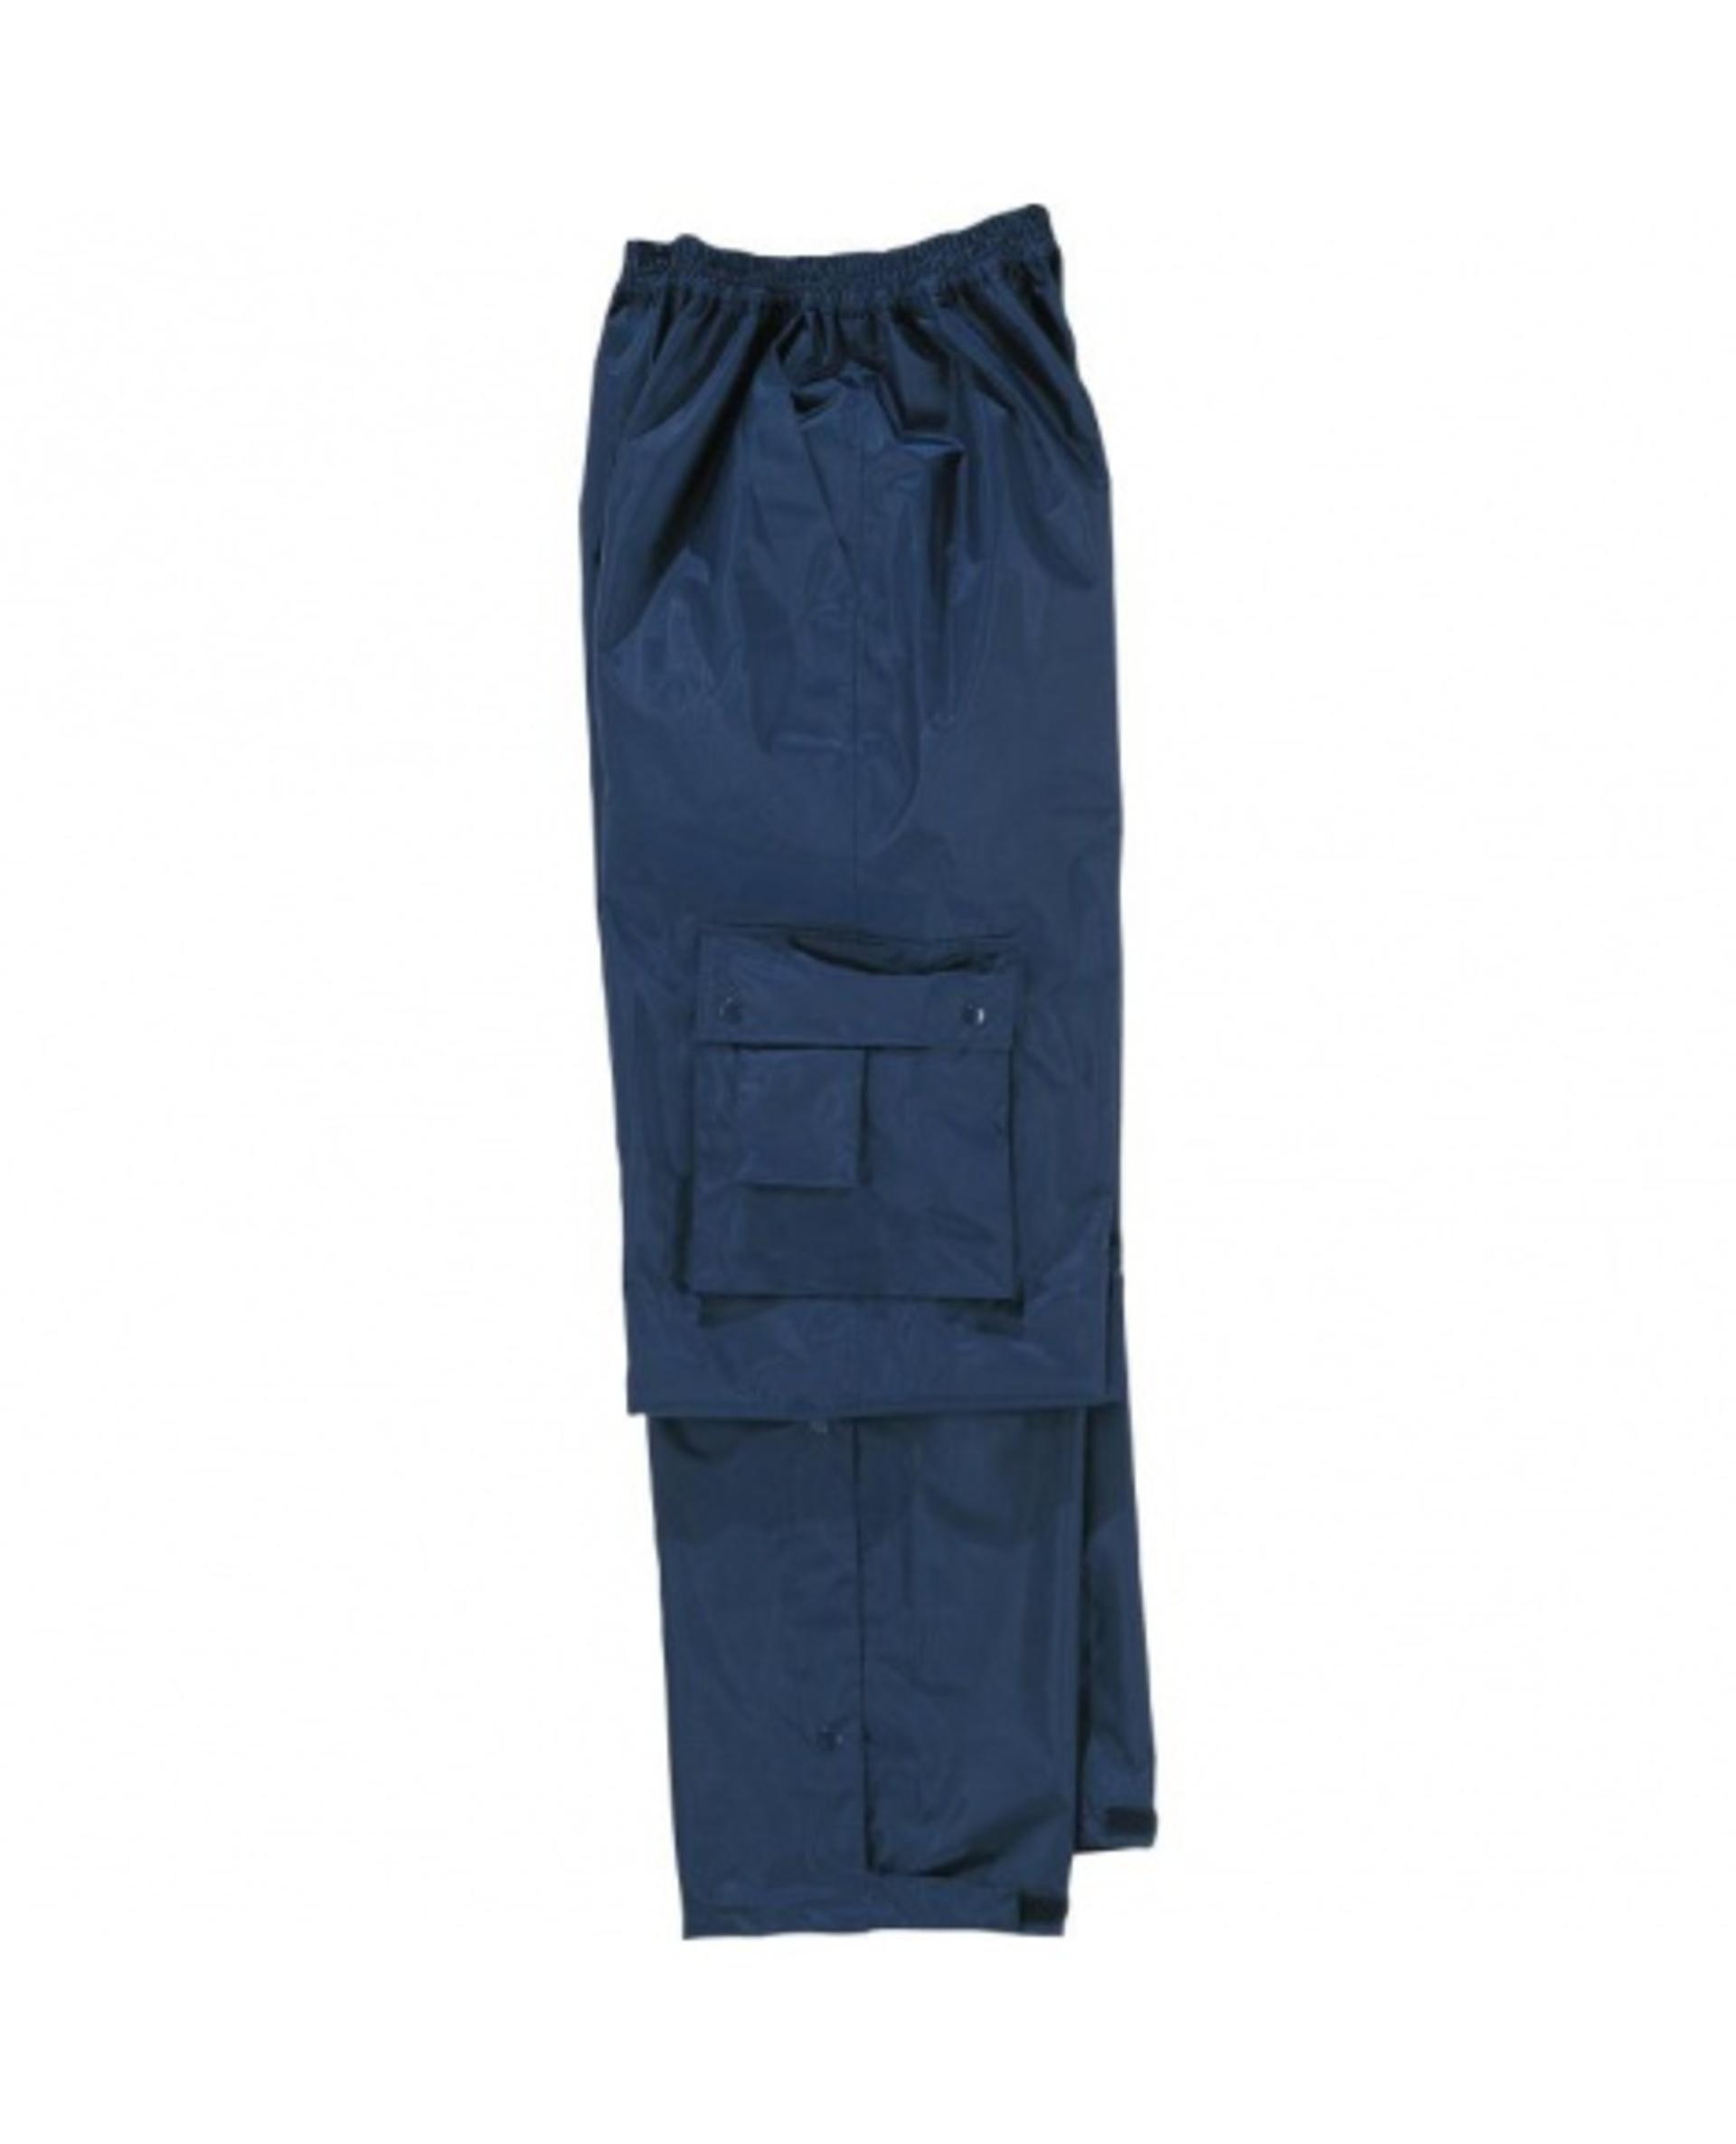 Levně DeltaPlus TYPHOON Kalhoty nepromokavé nám.modrá XL